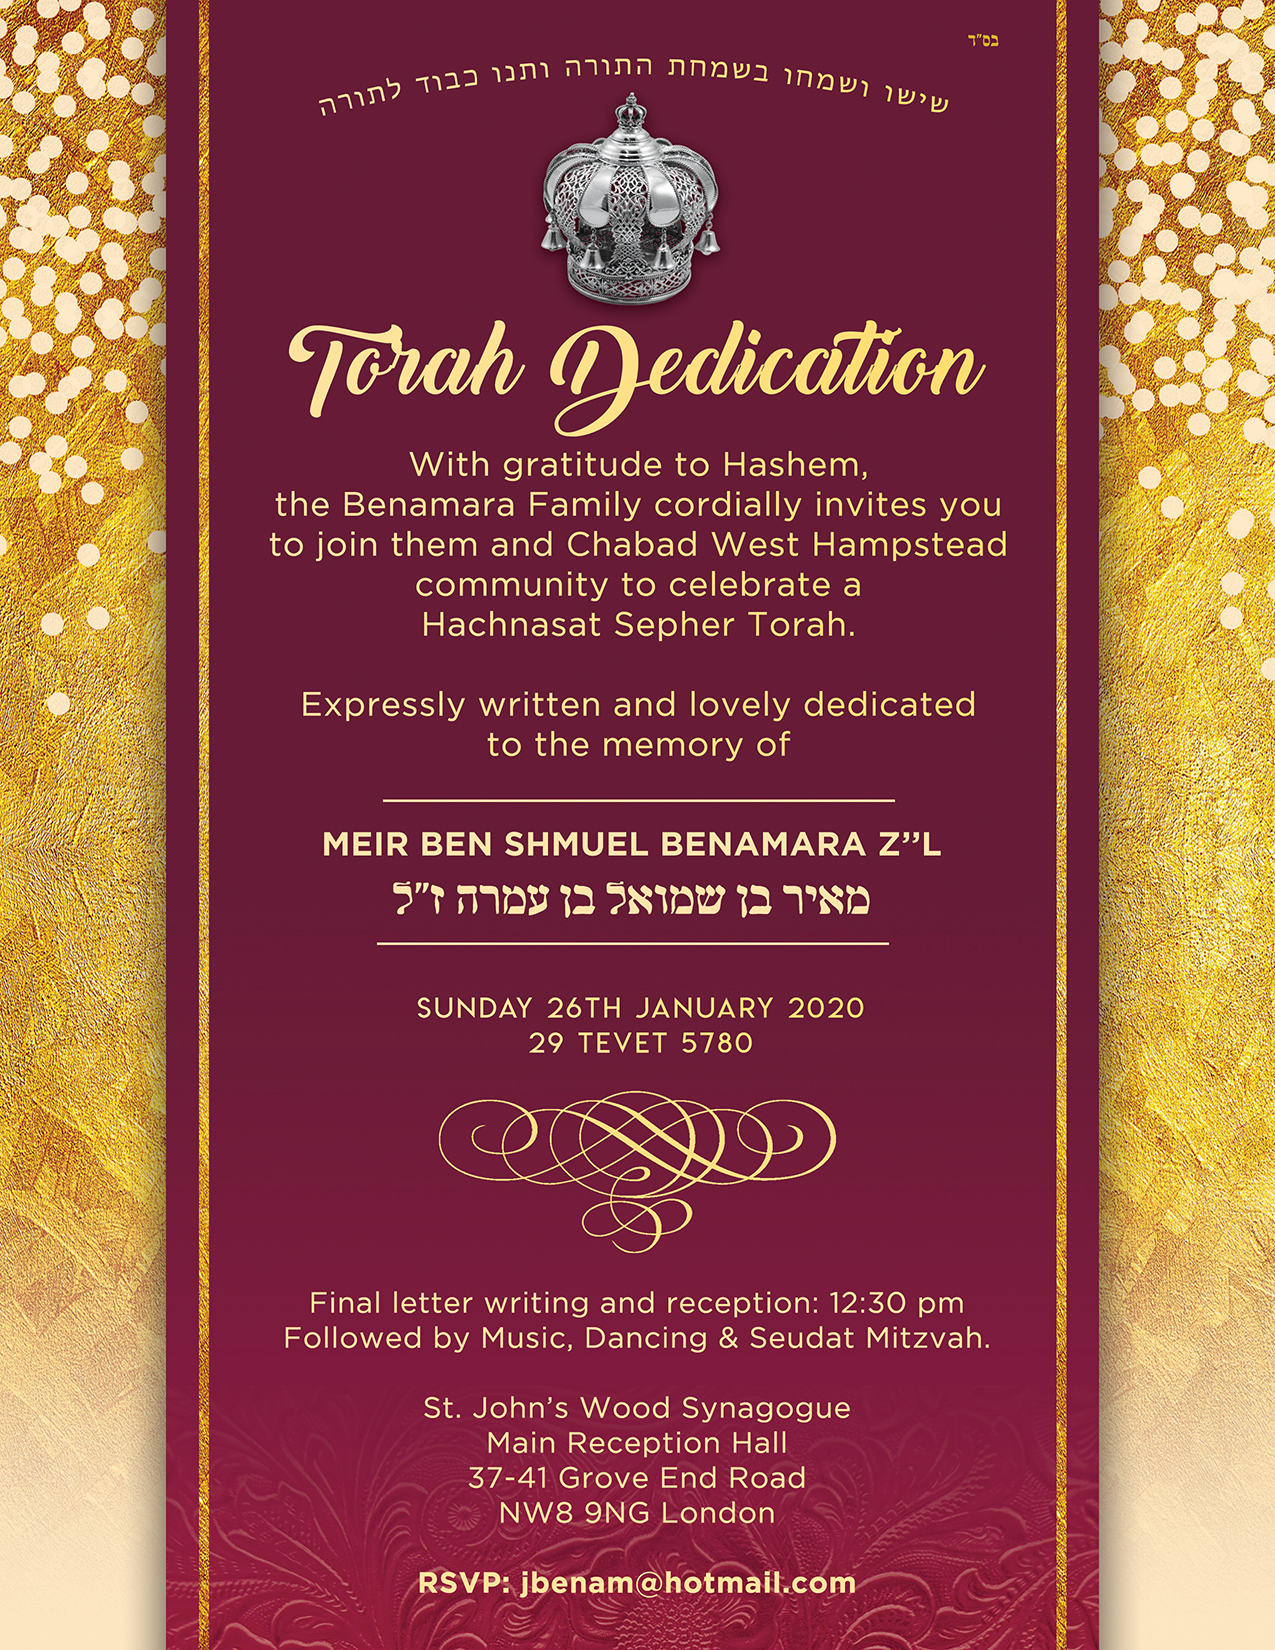 ChabadNW6 Torah Dedication Flyer (web).jpg